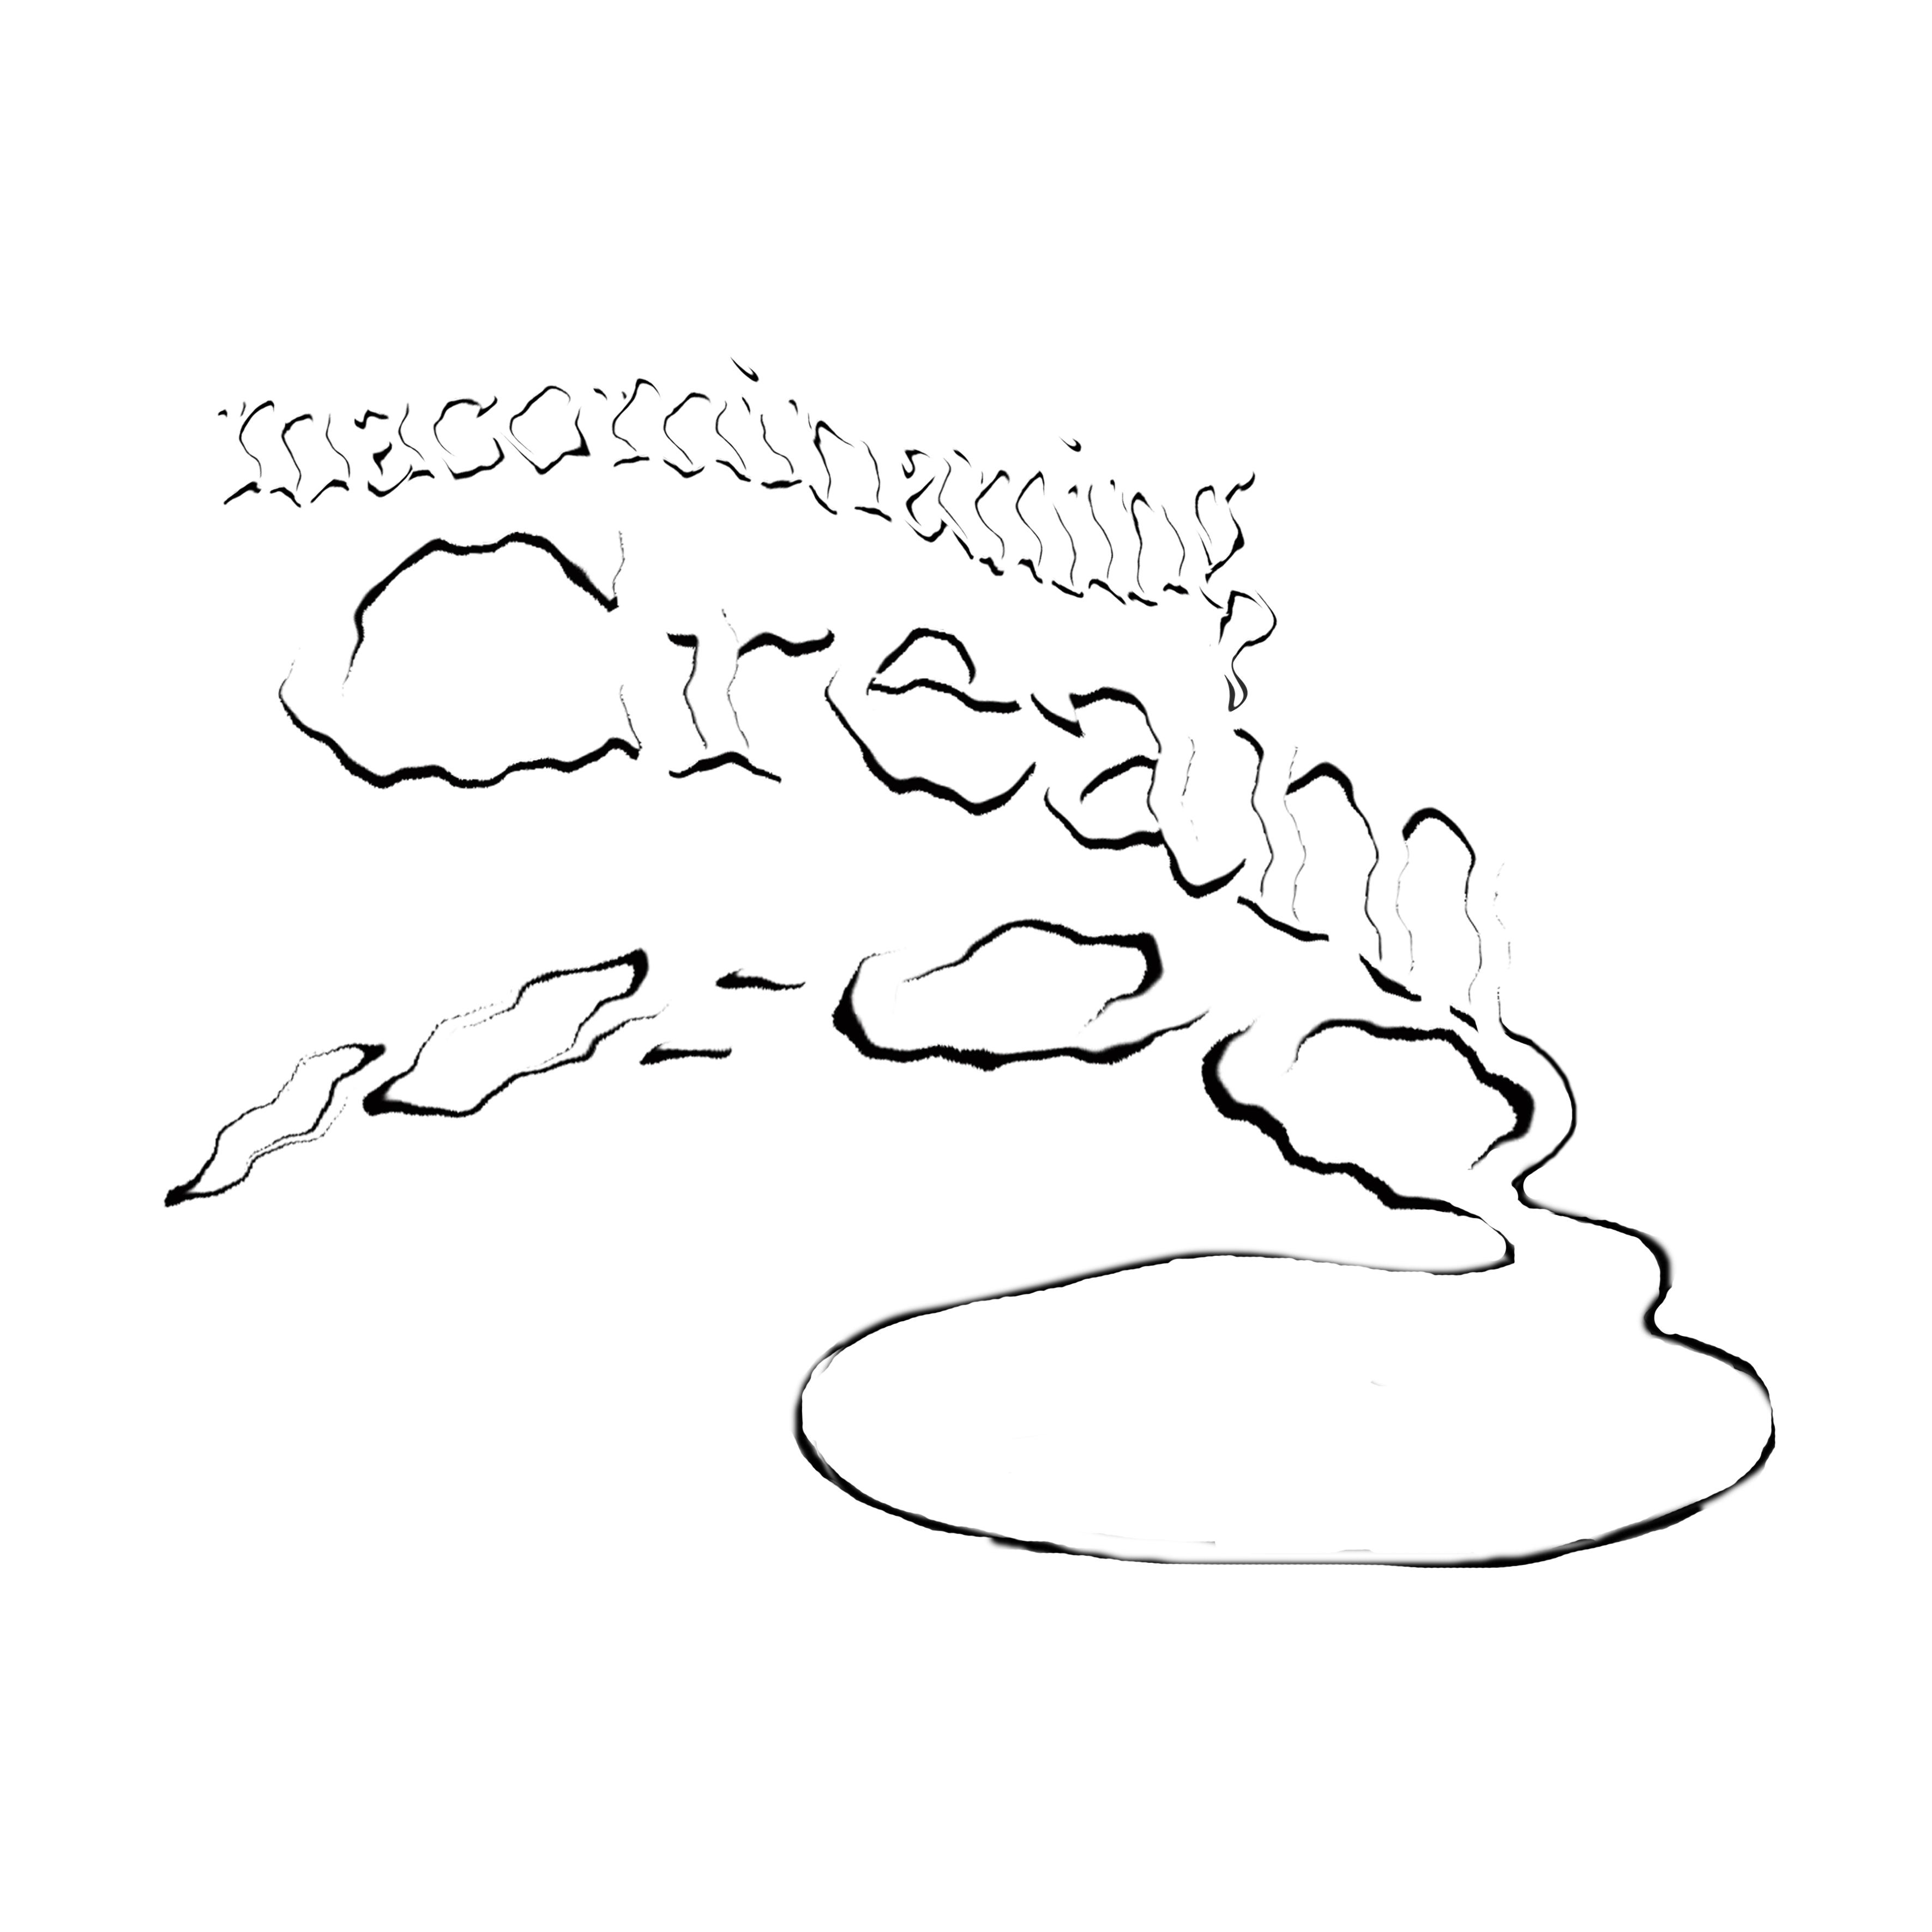 Cream_NickAM_Remix